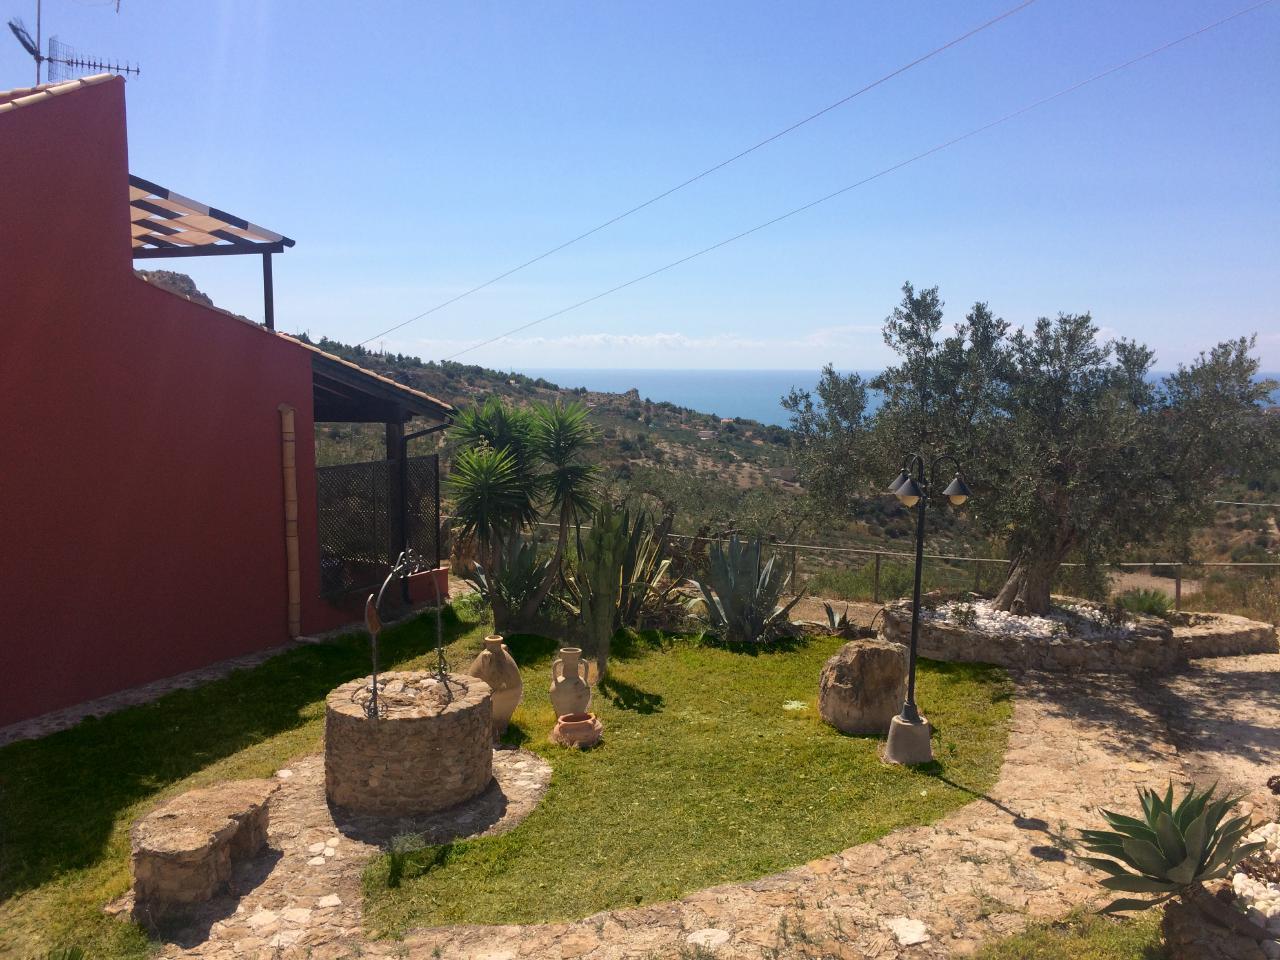 Appartement de vacances Ferienwohnungen (404150), Sciacca, Agrigento, Sicile, Italie, image 12